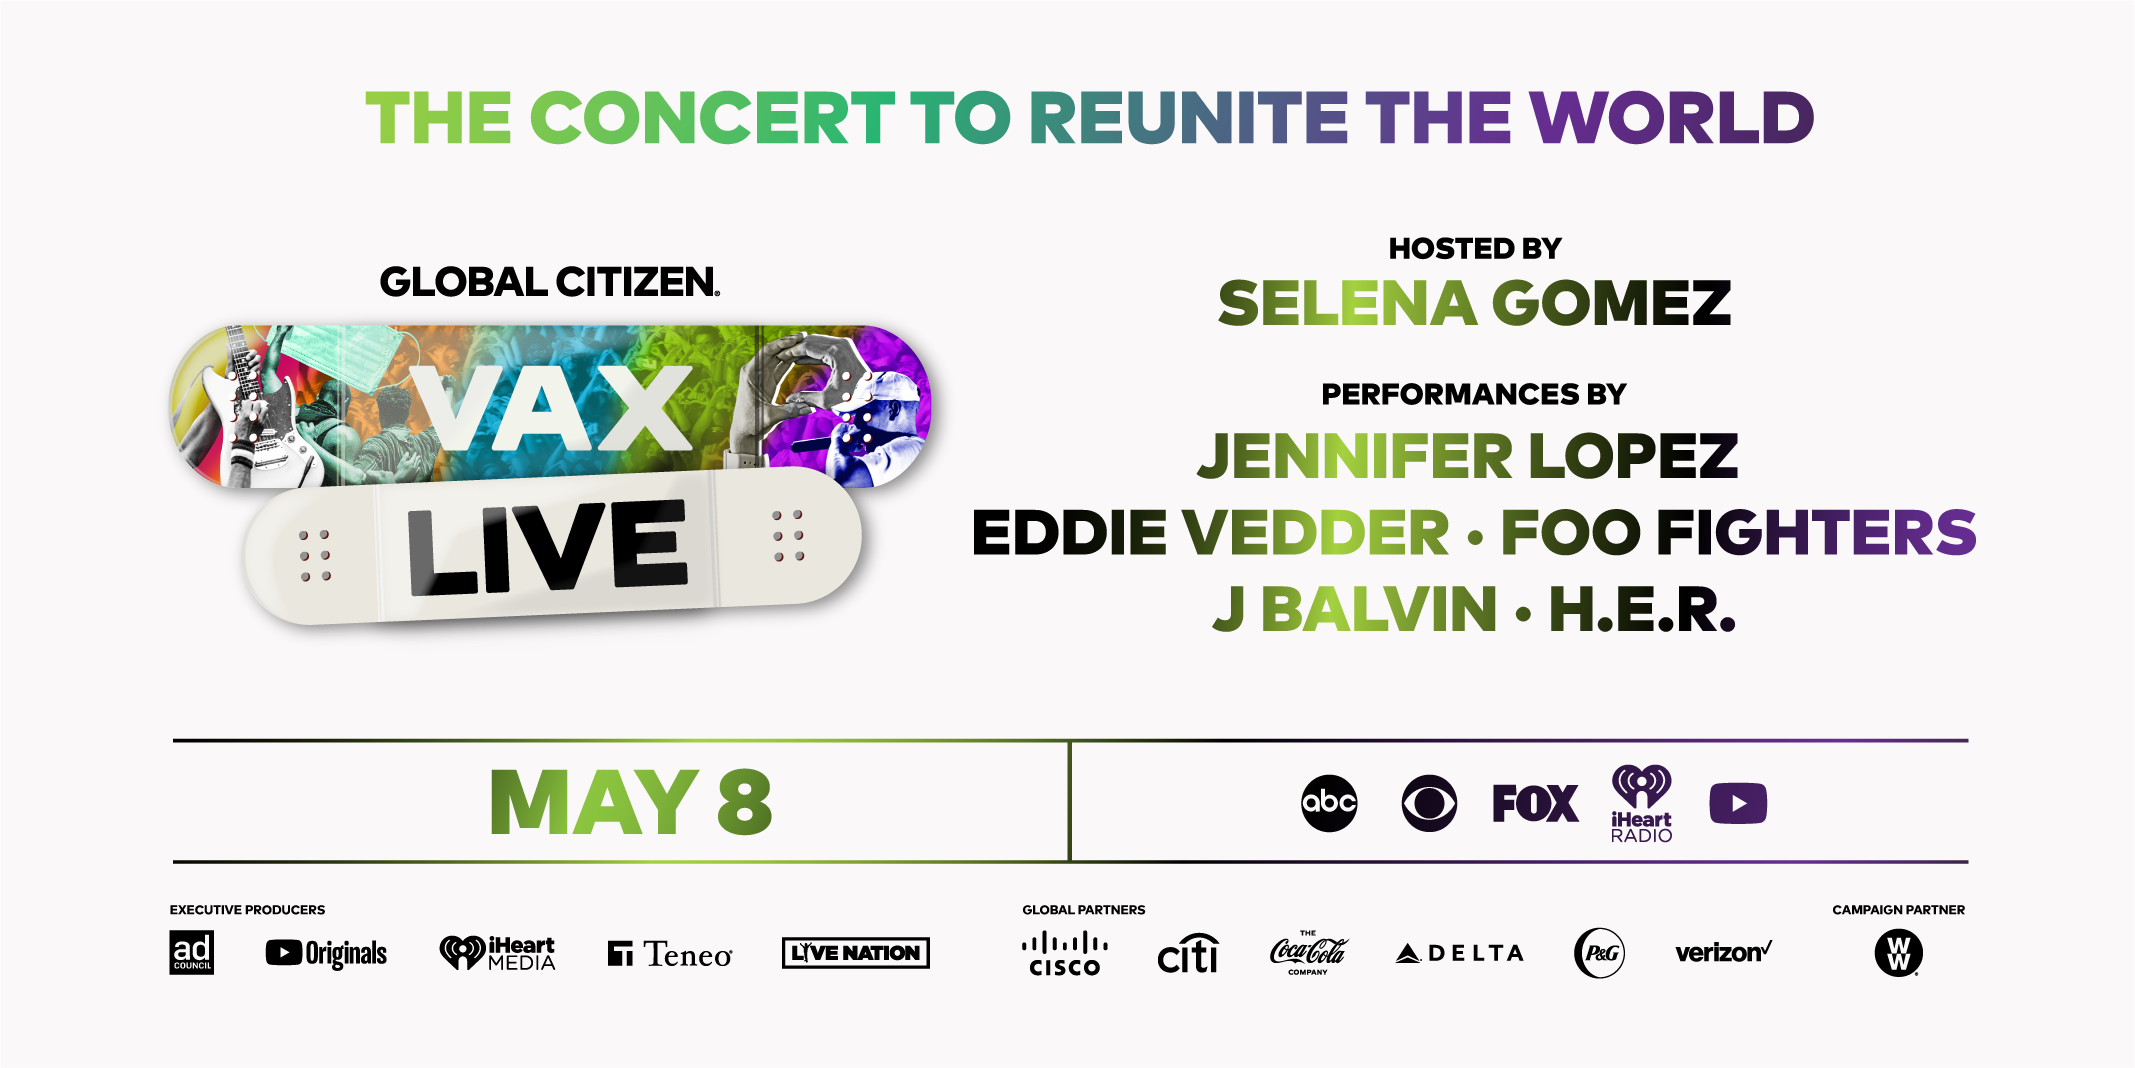 vax live concerto